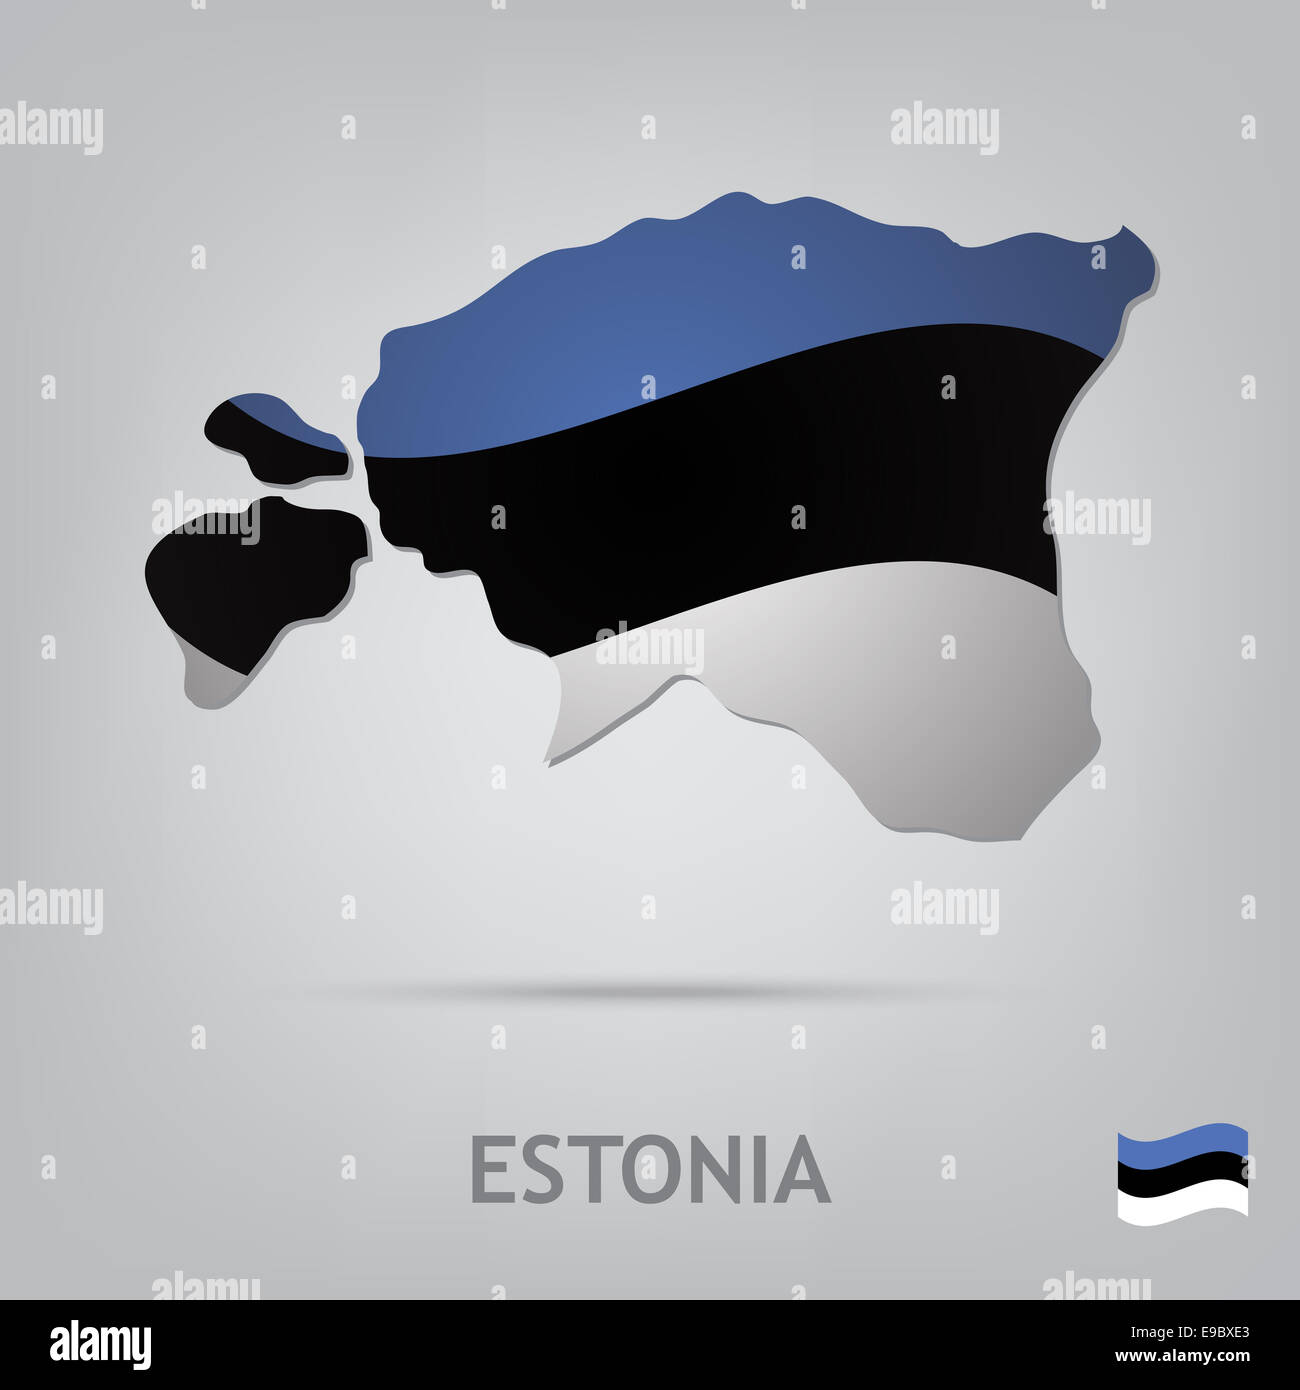 estonia - Stock Image